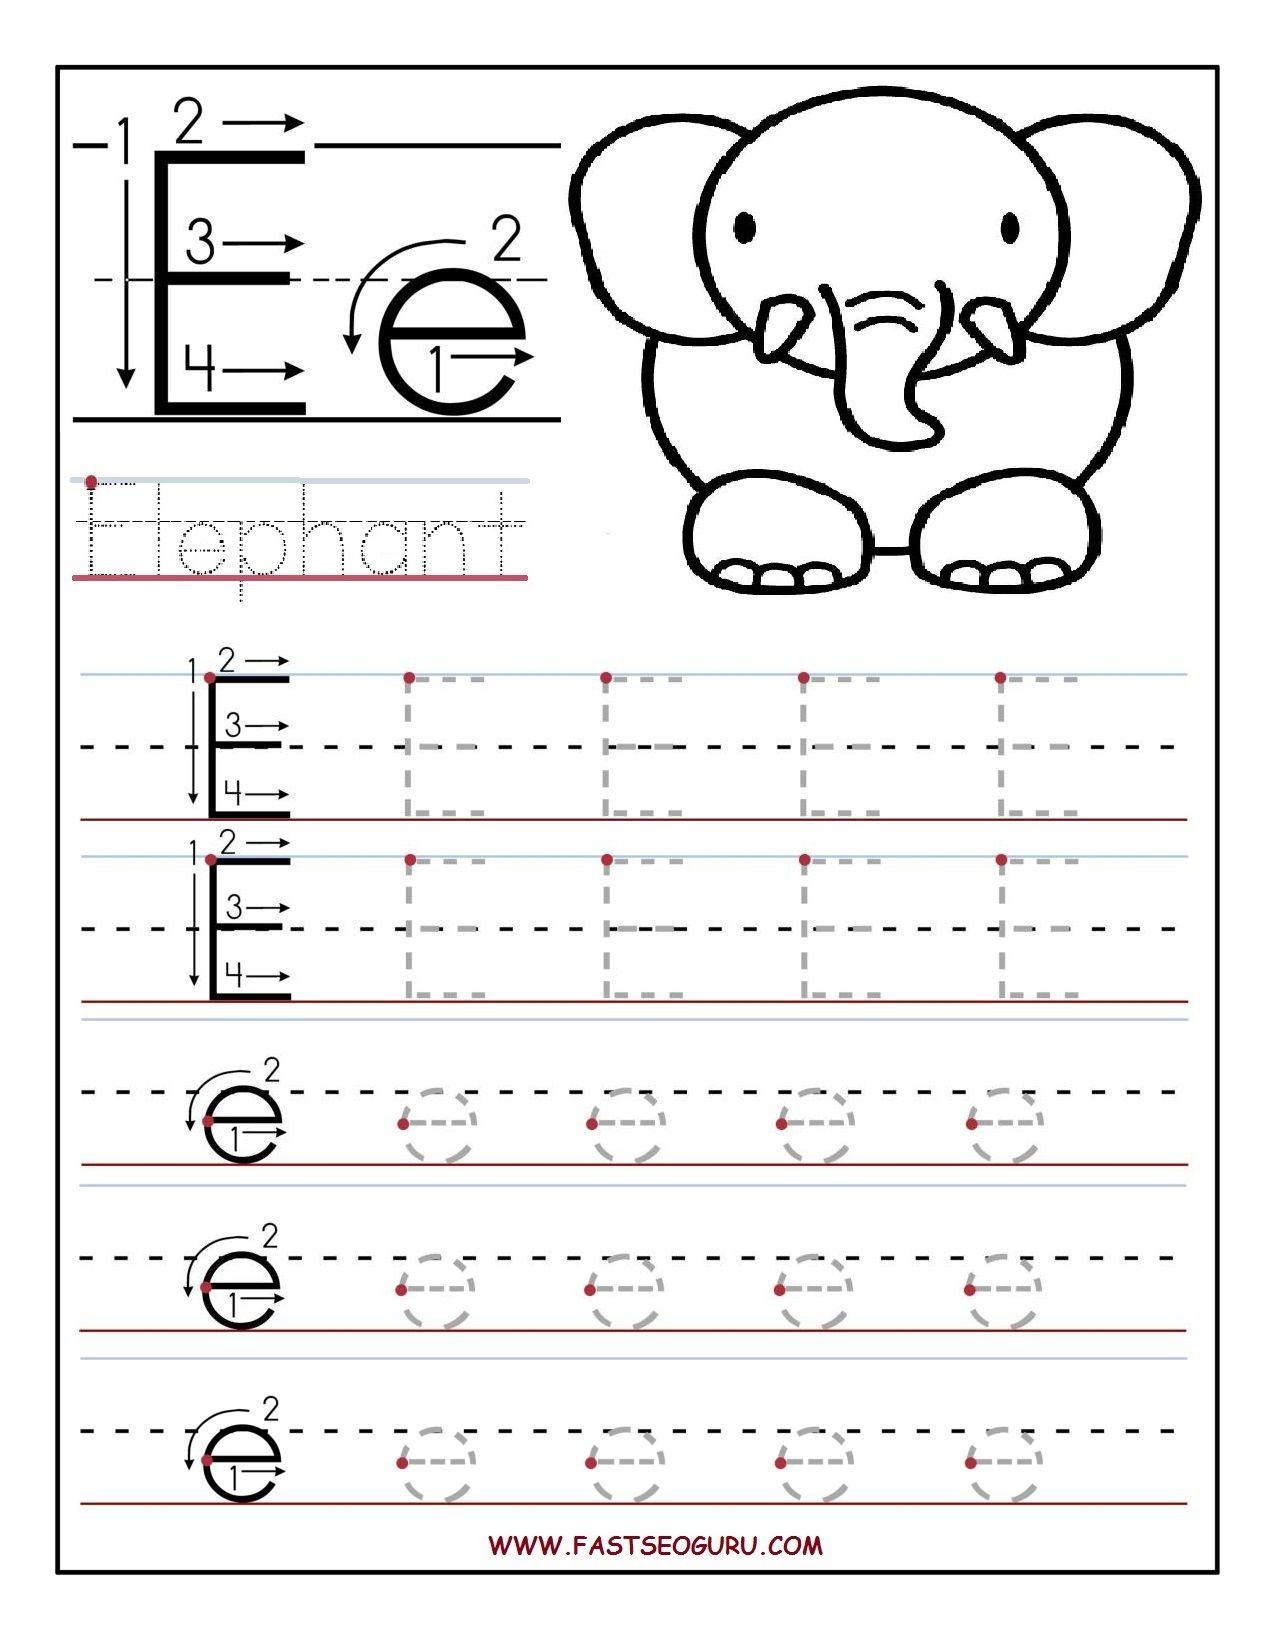 Printable Letter E Tracing Worksheets For Preschool intended for Letter E Worksheets Pdf